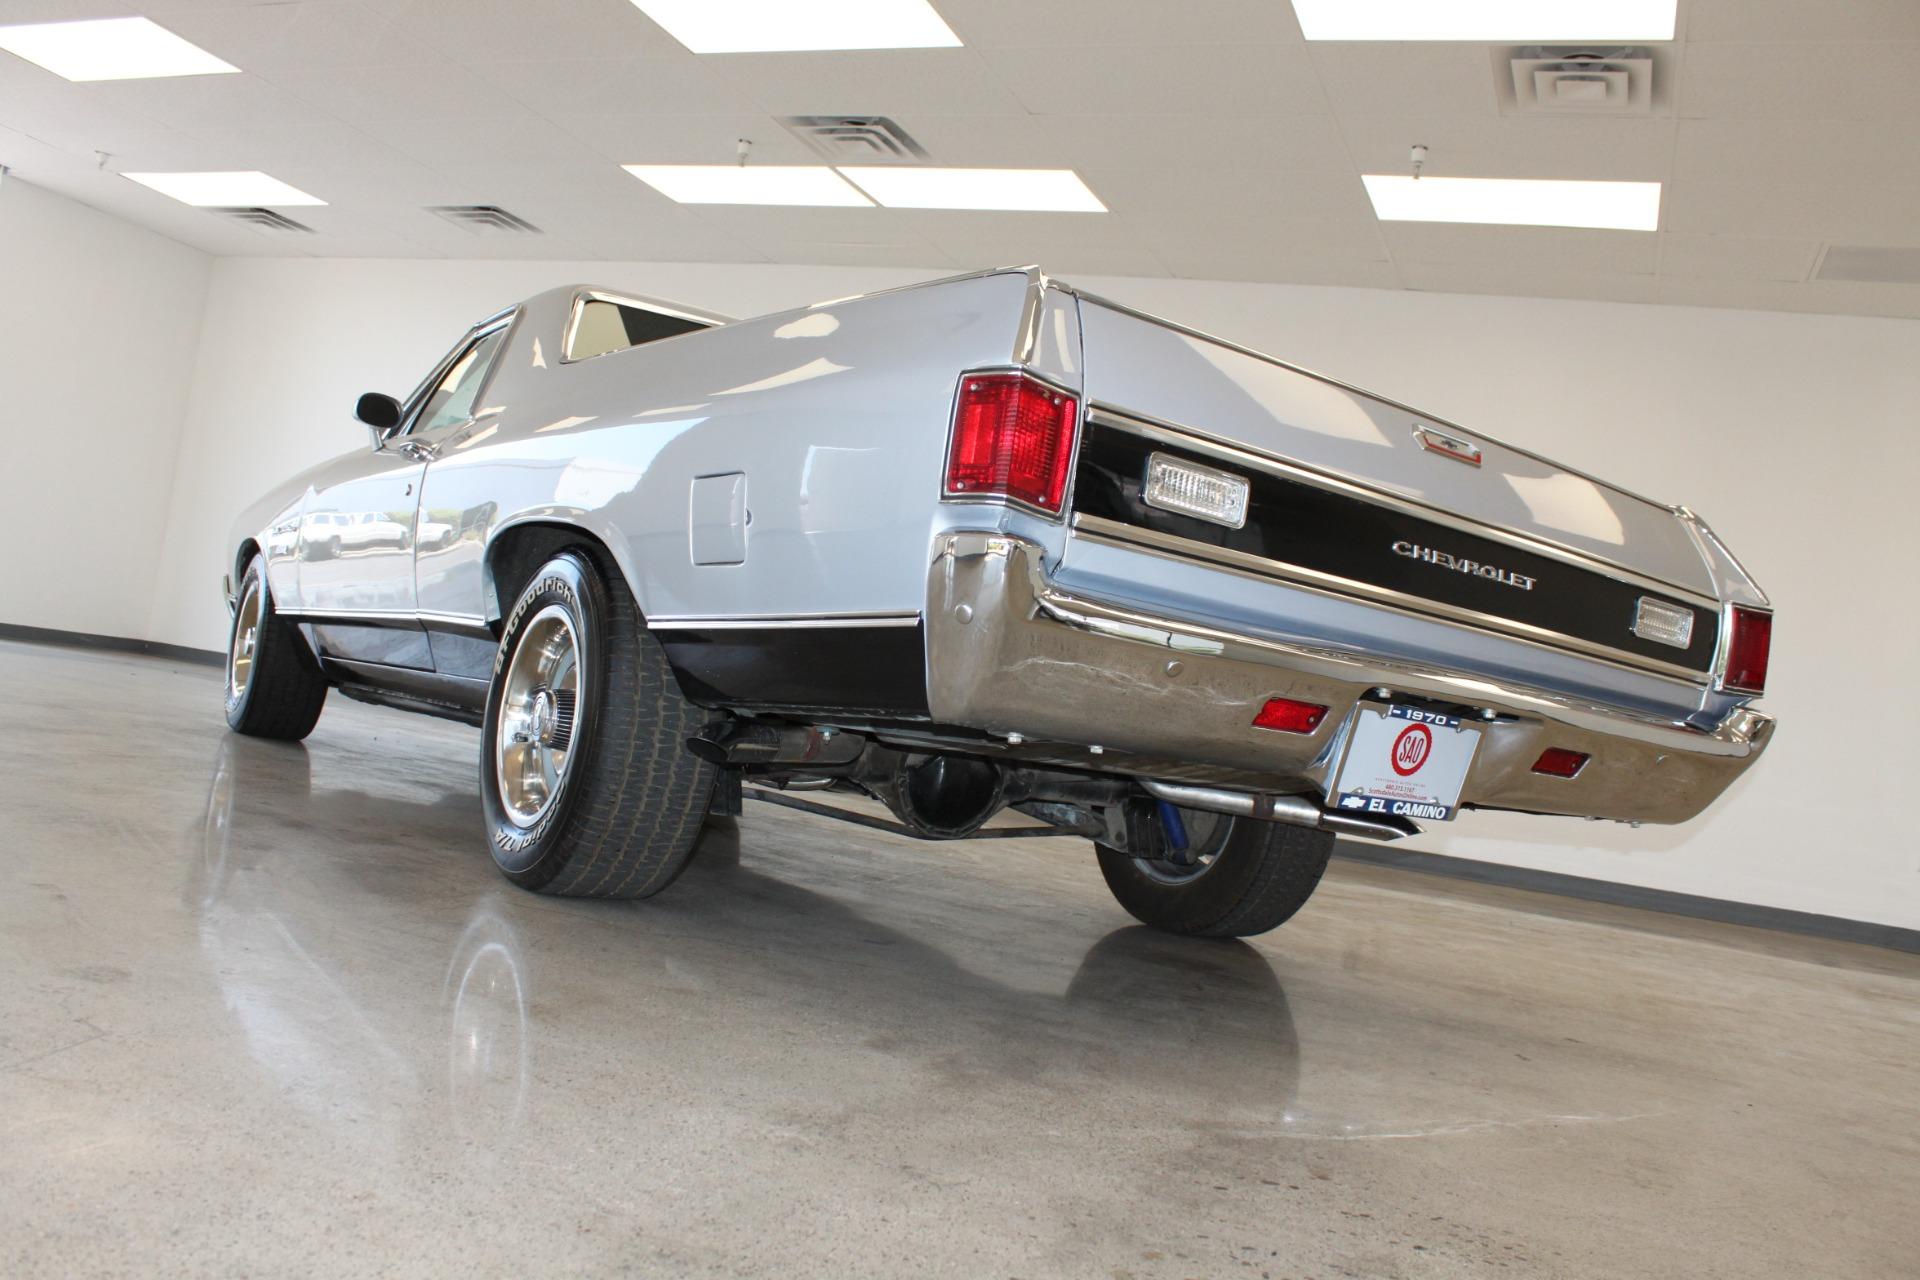 Used-1970-Chevrolet-El-Camino-Custom-350-ci-Chevelle